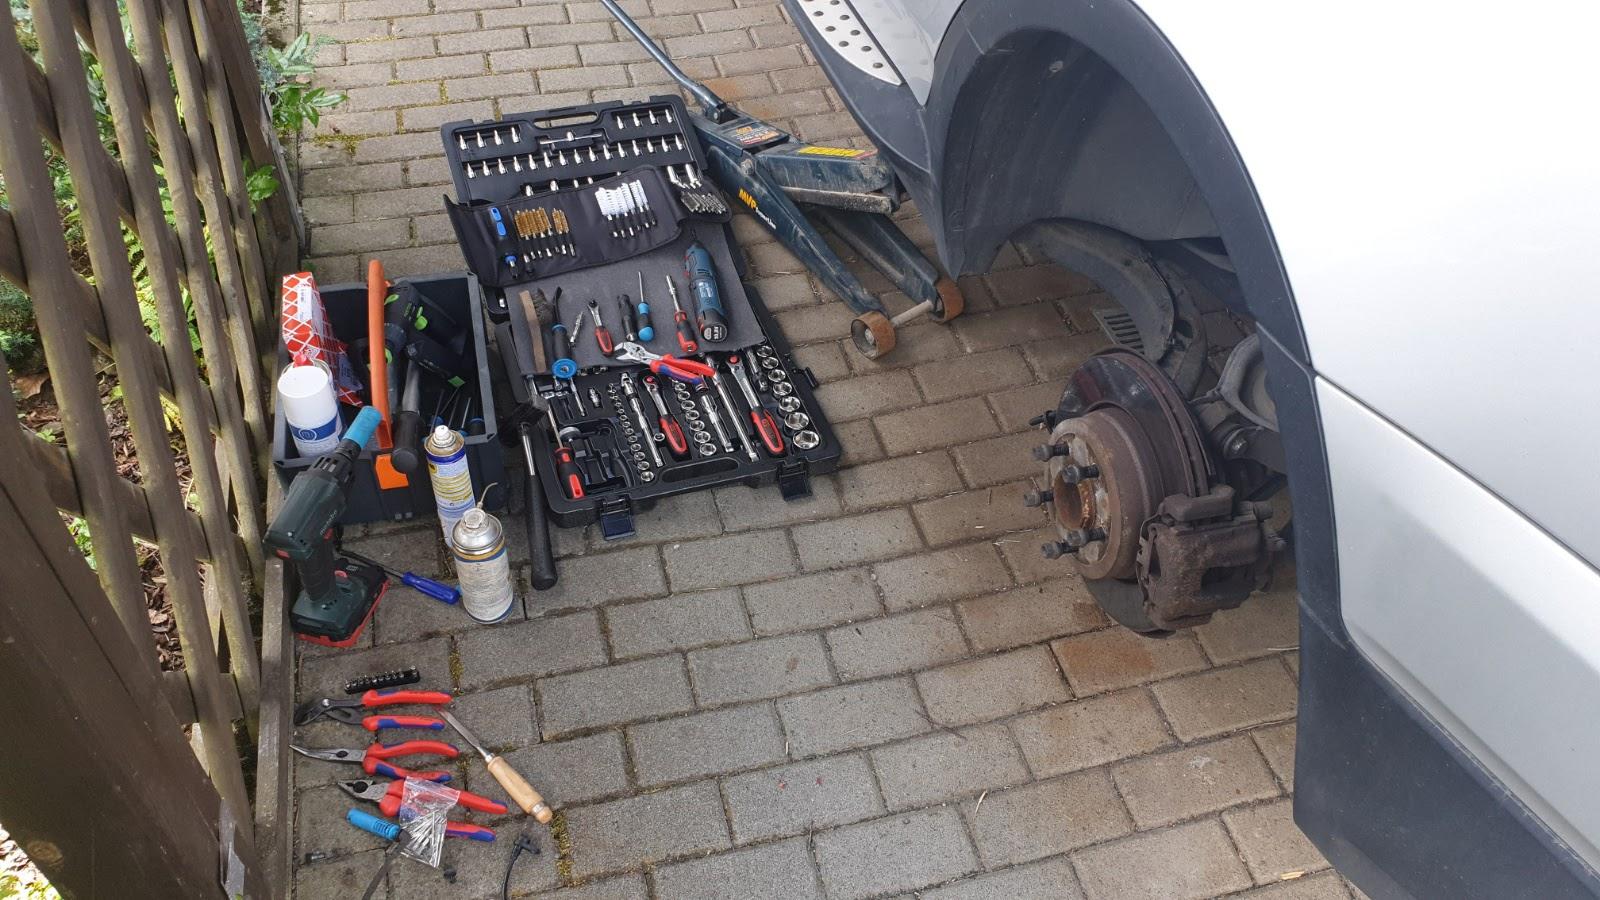 ABS RING Sensorring 48 Zähne für BMW X3 X-3 E83 E-83 HINTEN HOHE QUALITÄT NEU